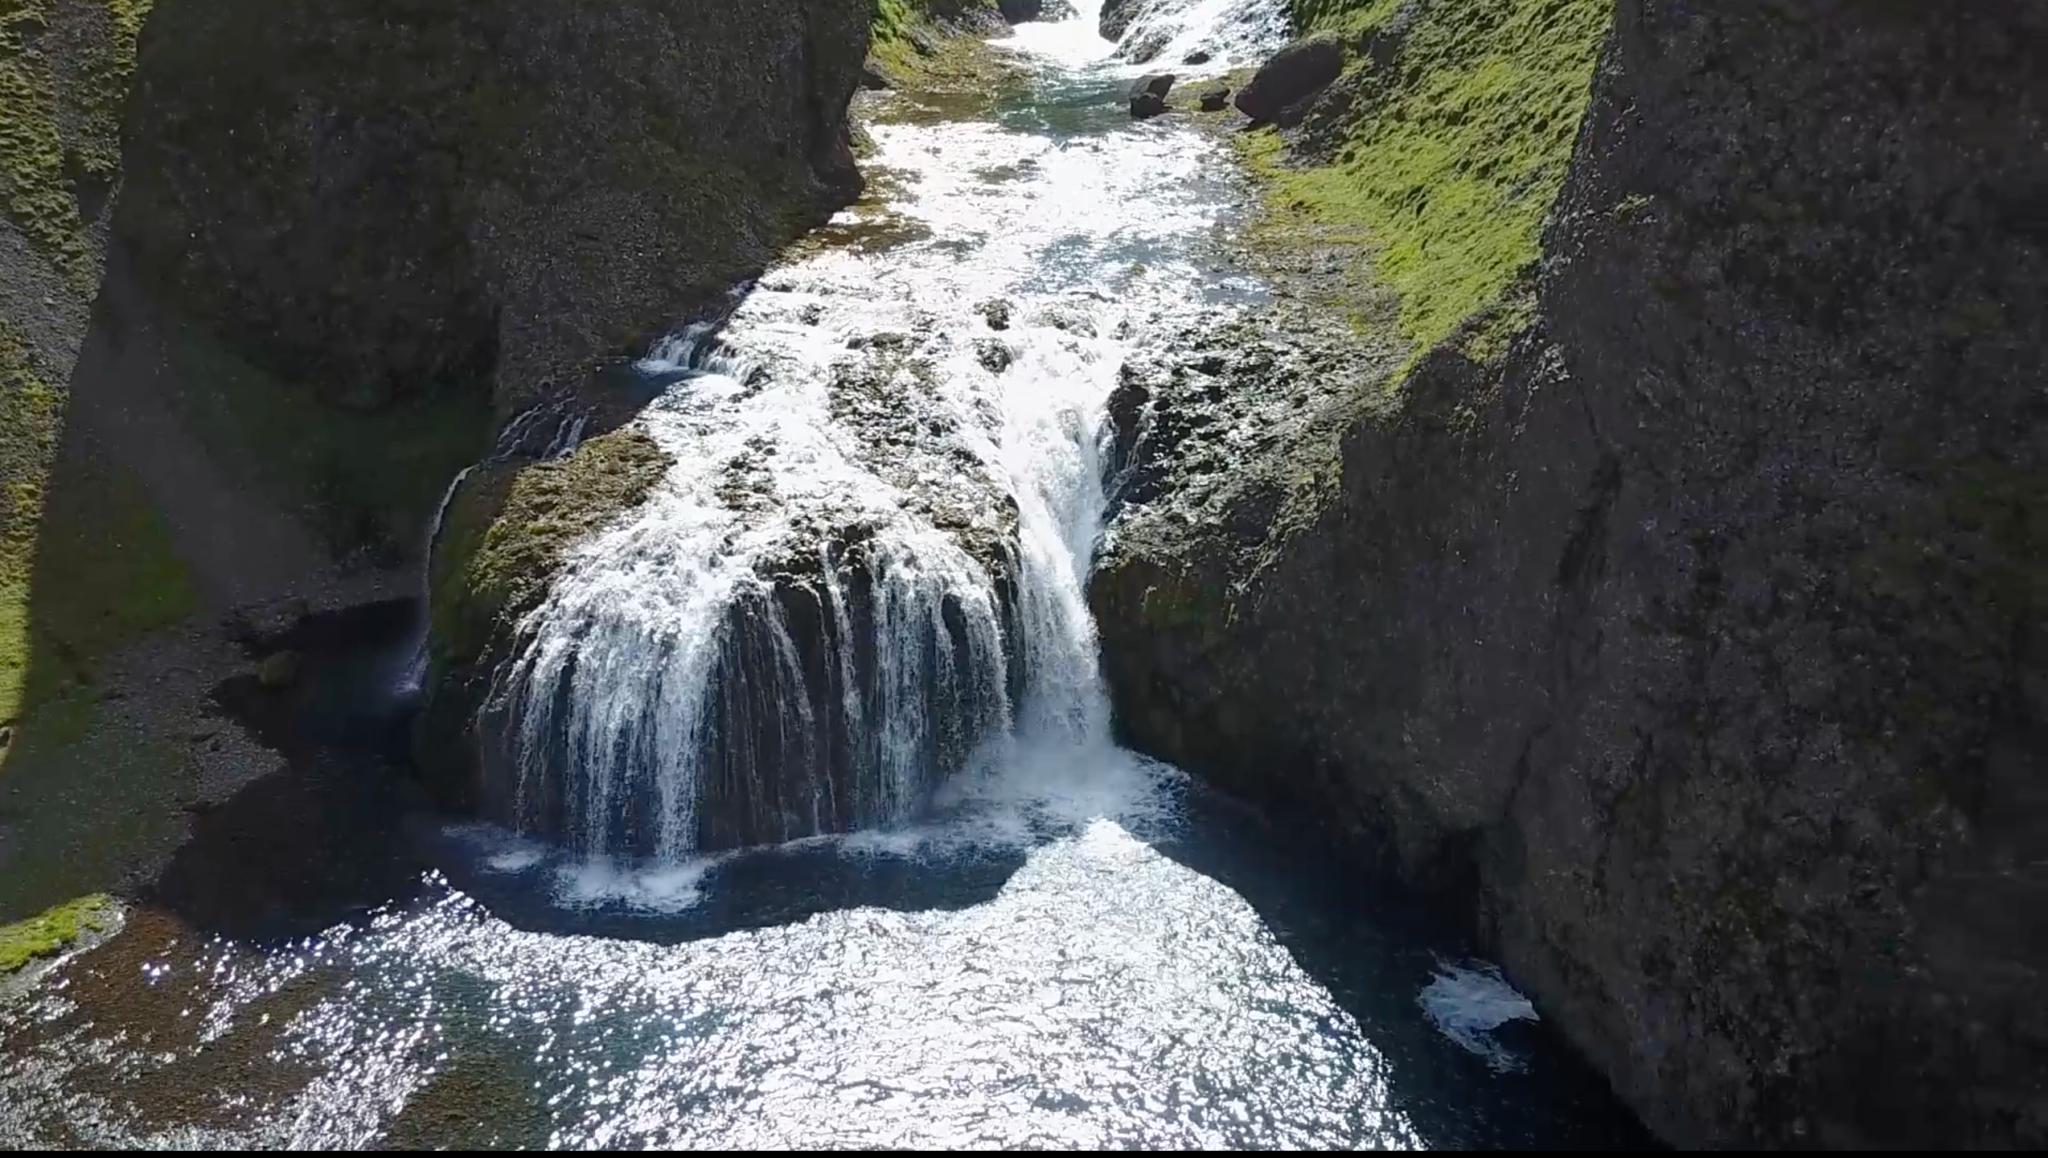 Islande jour 13 : Parc national de Skaftafell et Skógafoss